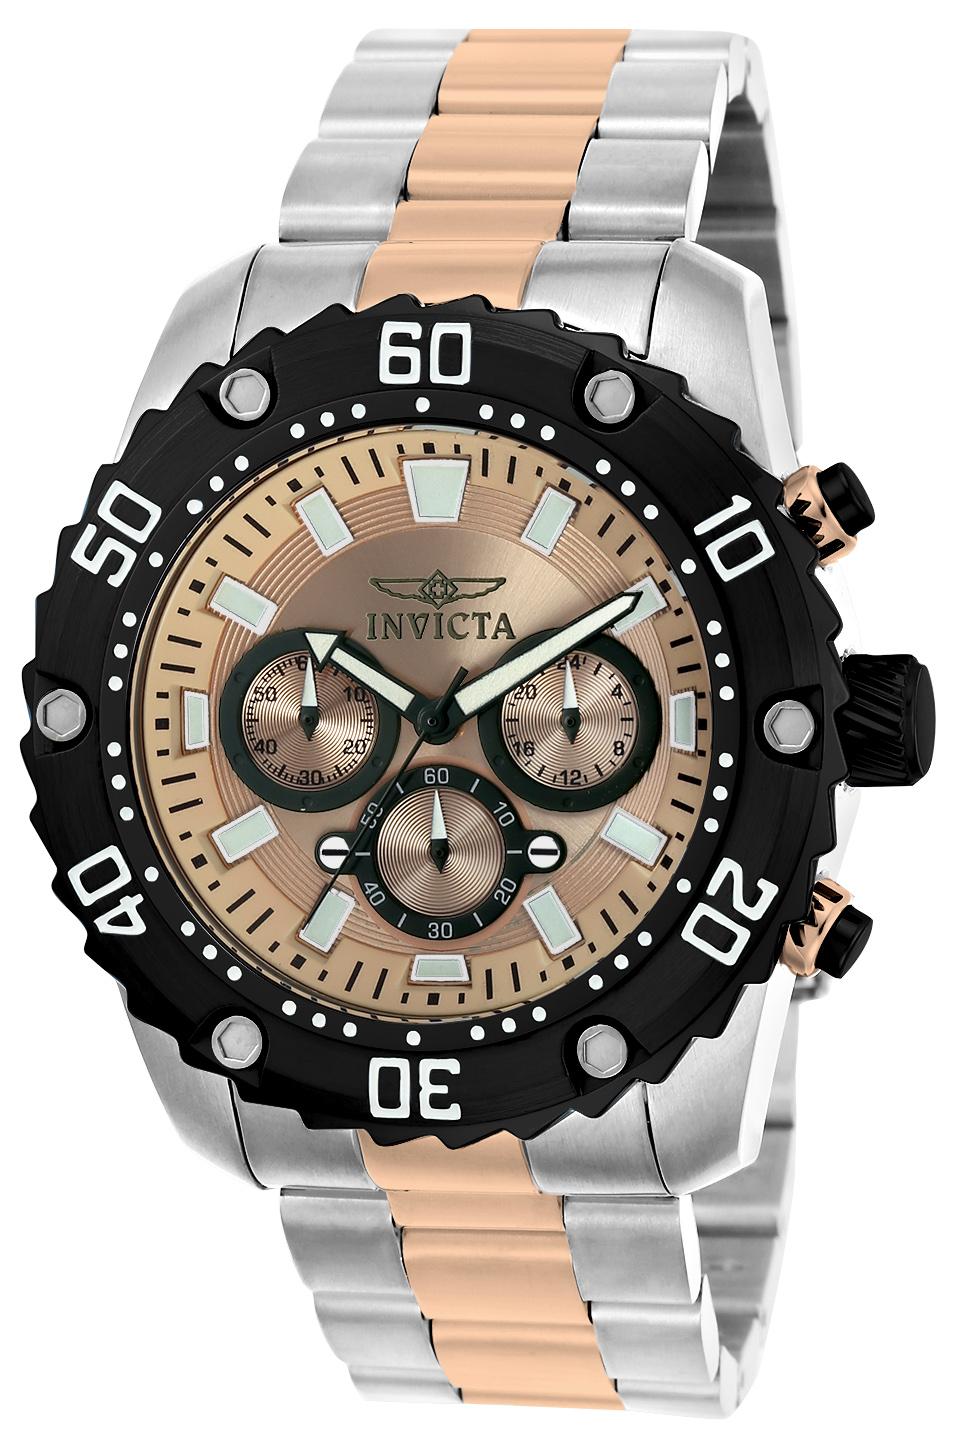 Invicta Men's 22520 Pro Diver Quartz Chronograph Rose Gold Dial Watch